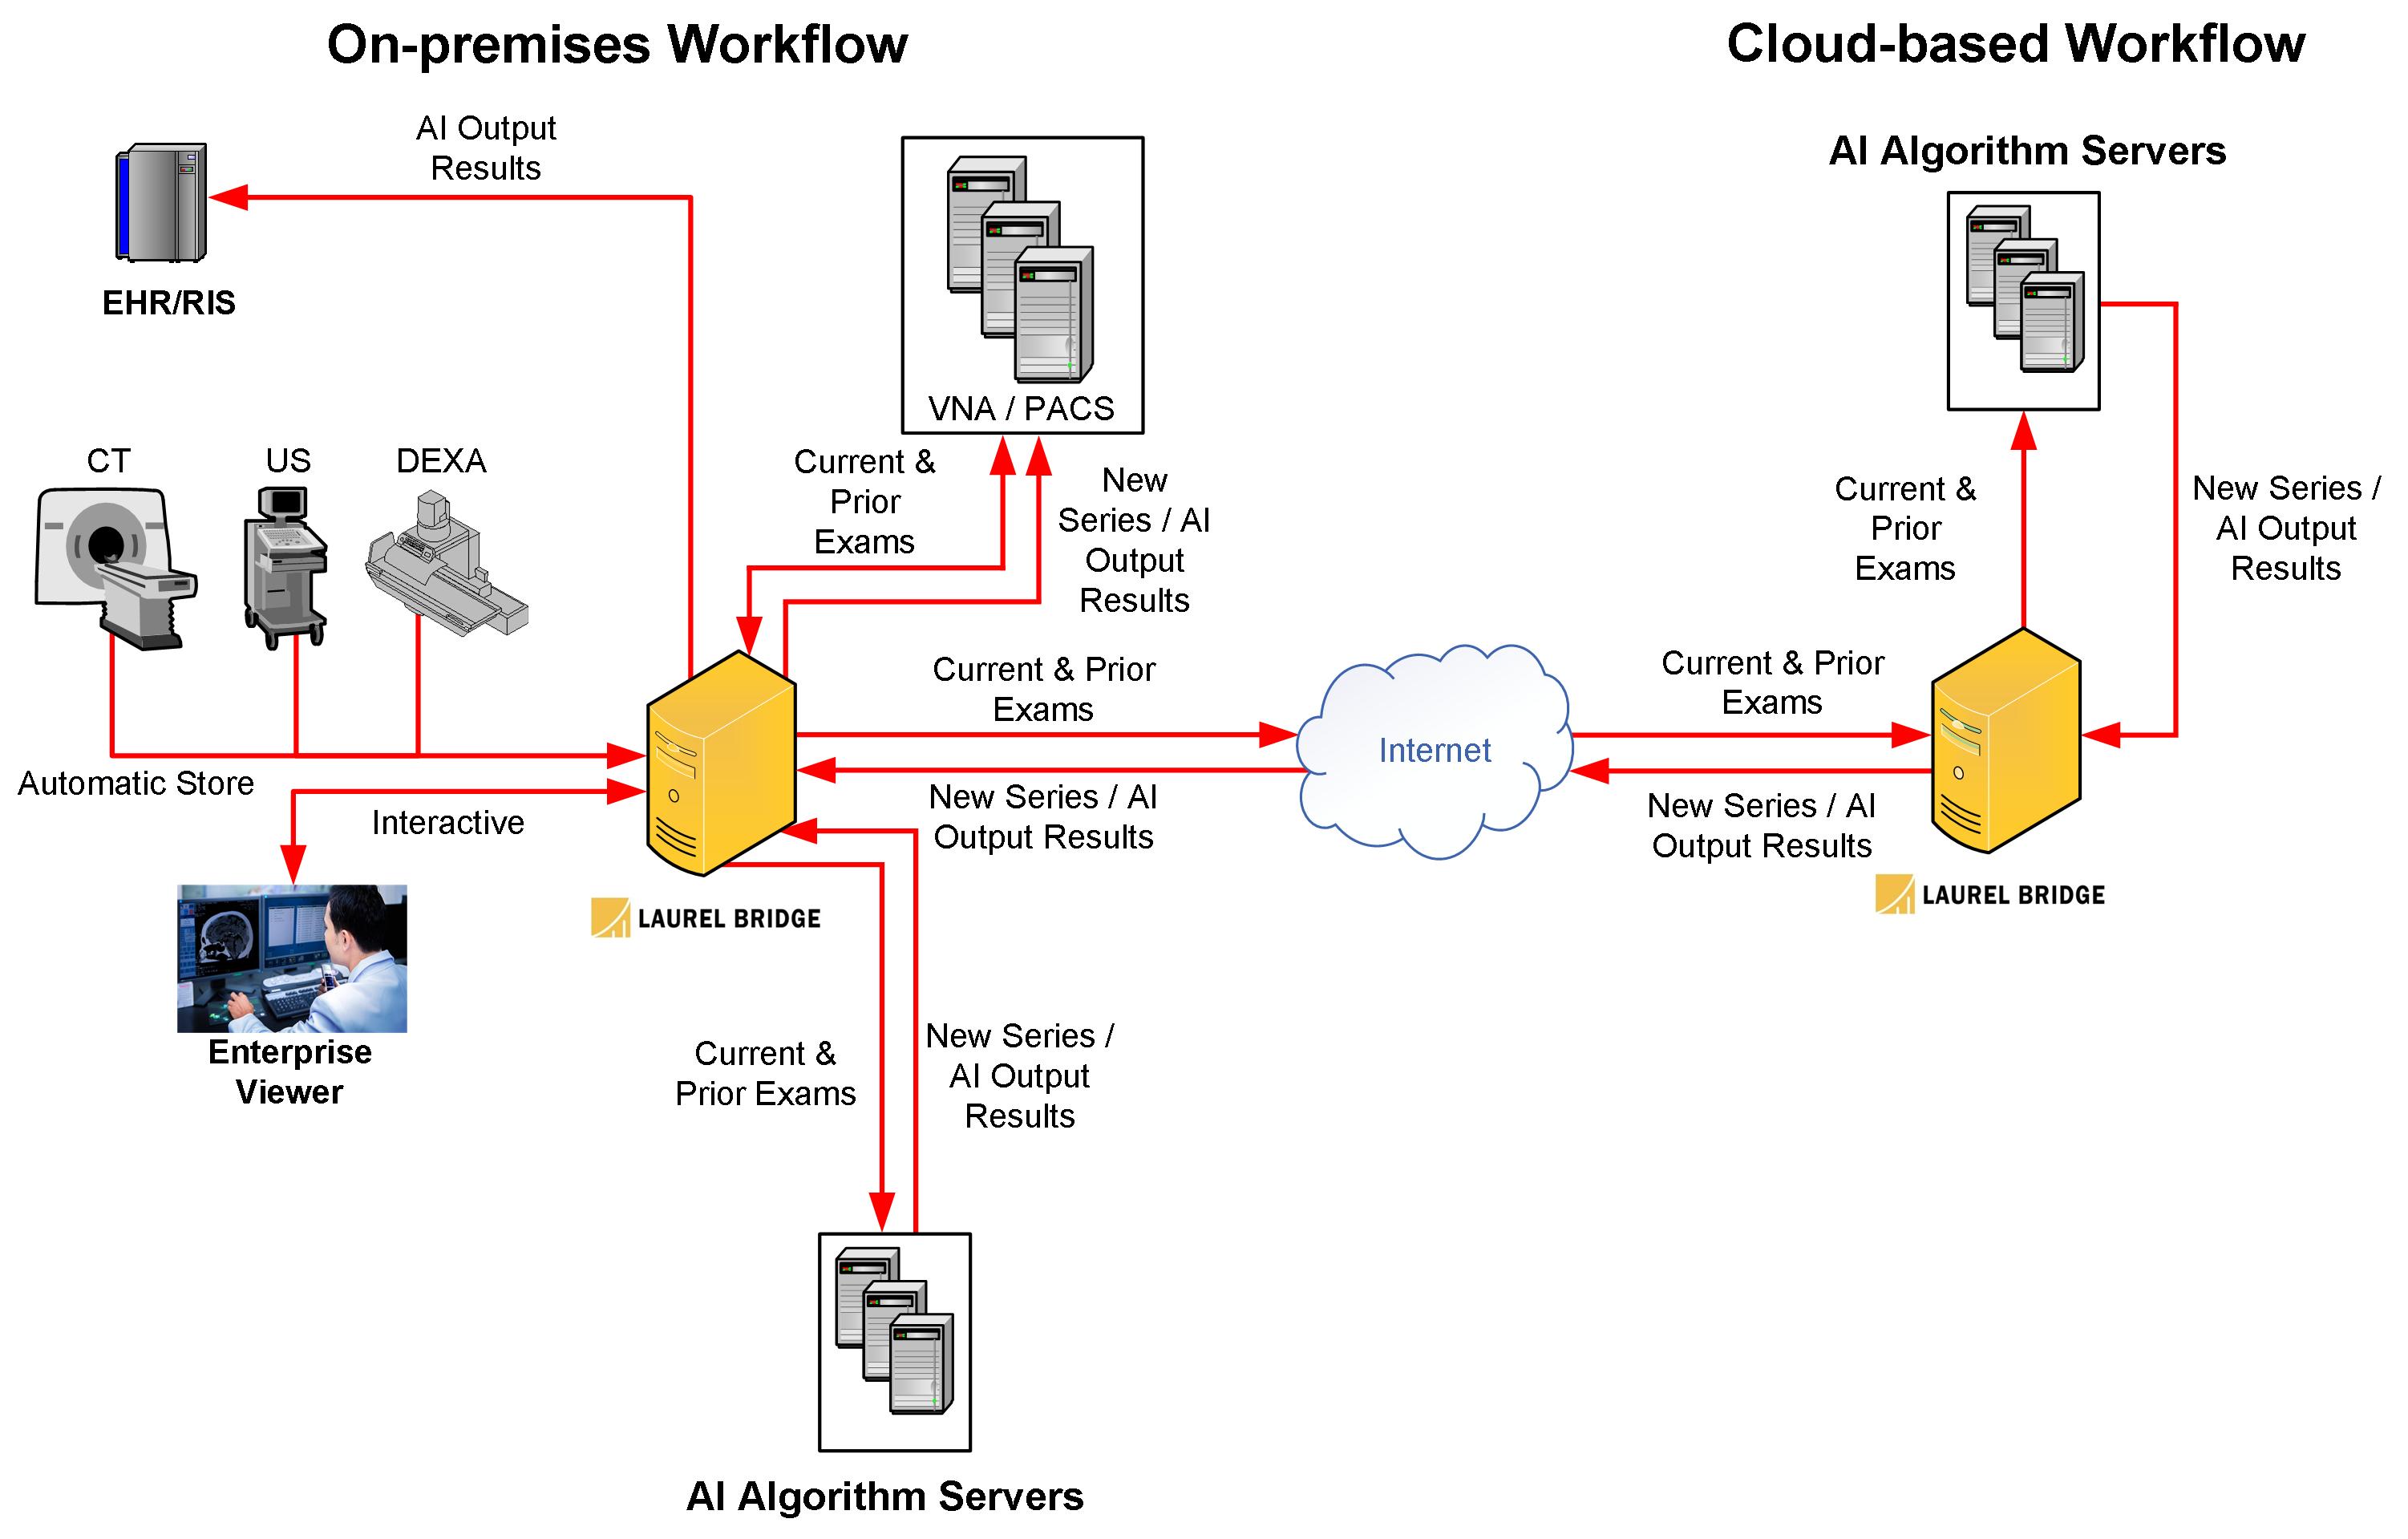 AI Workflow Comparison